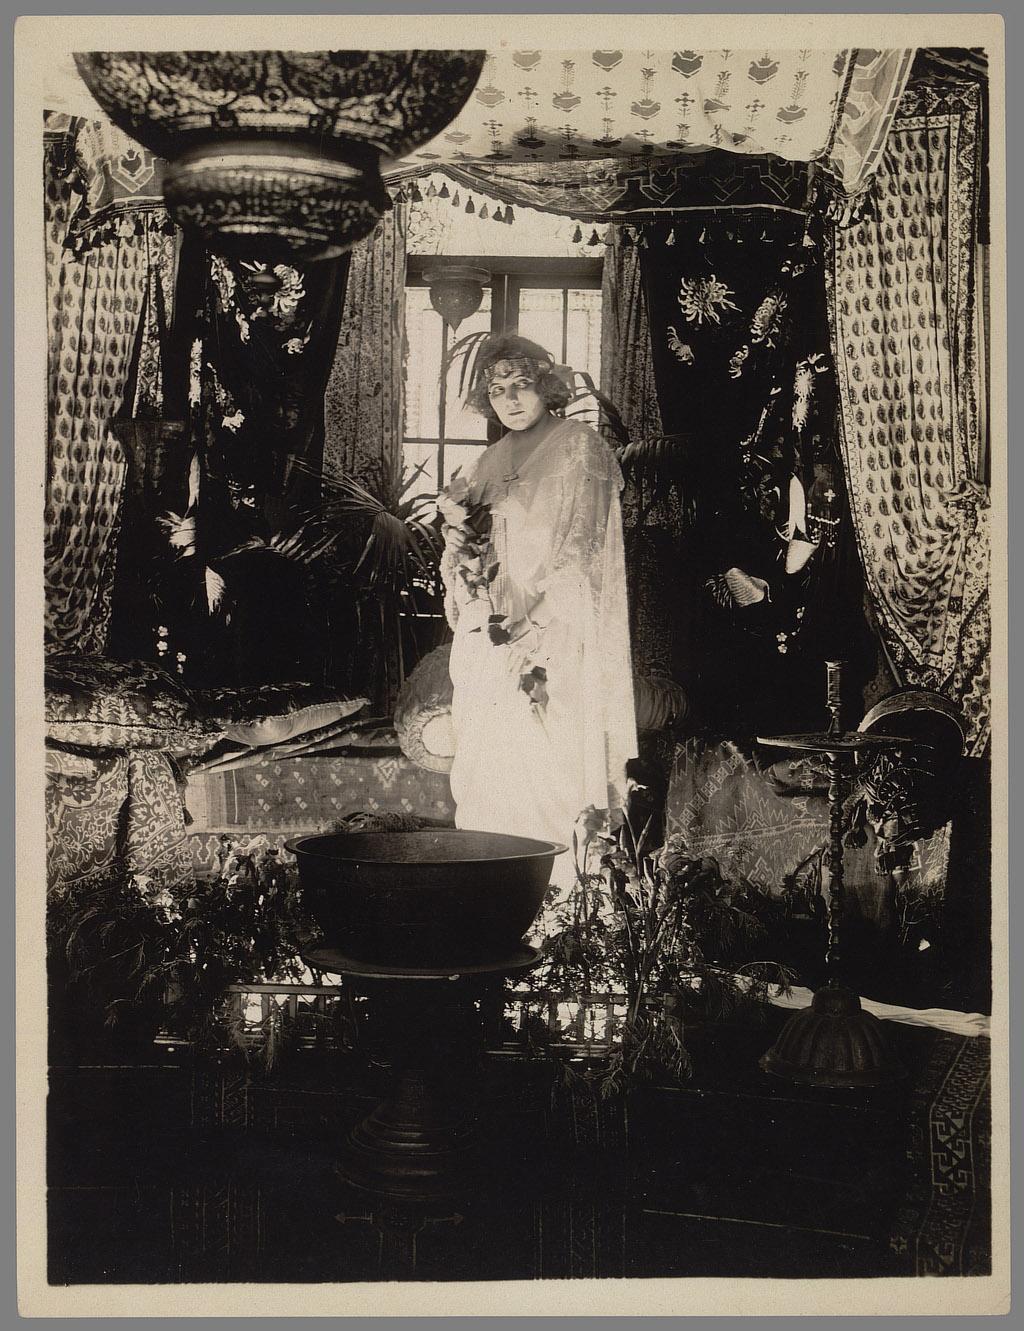 Raymond B. West, Wolf Woman. Coll. Cinémathèque française. D.R.